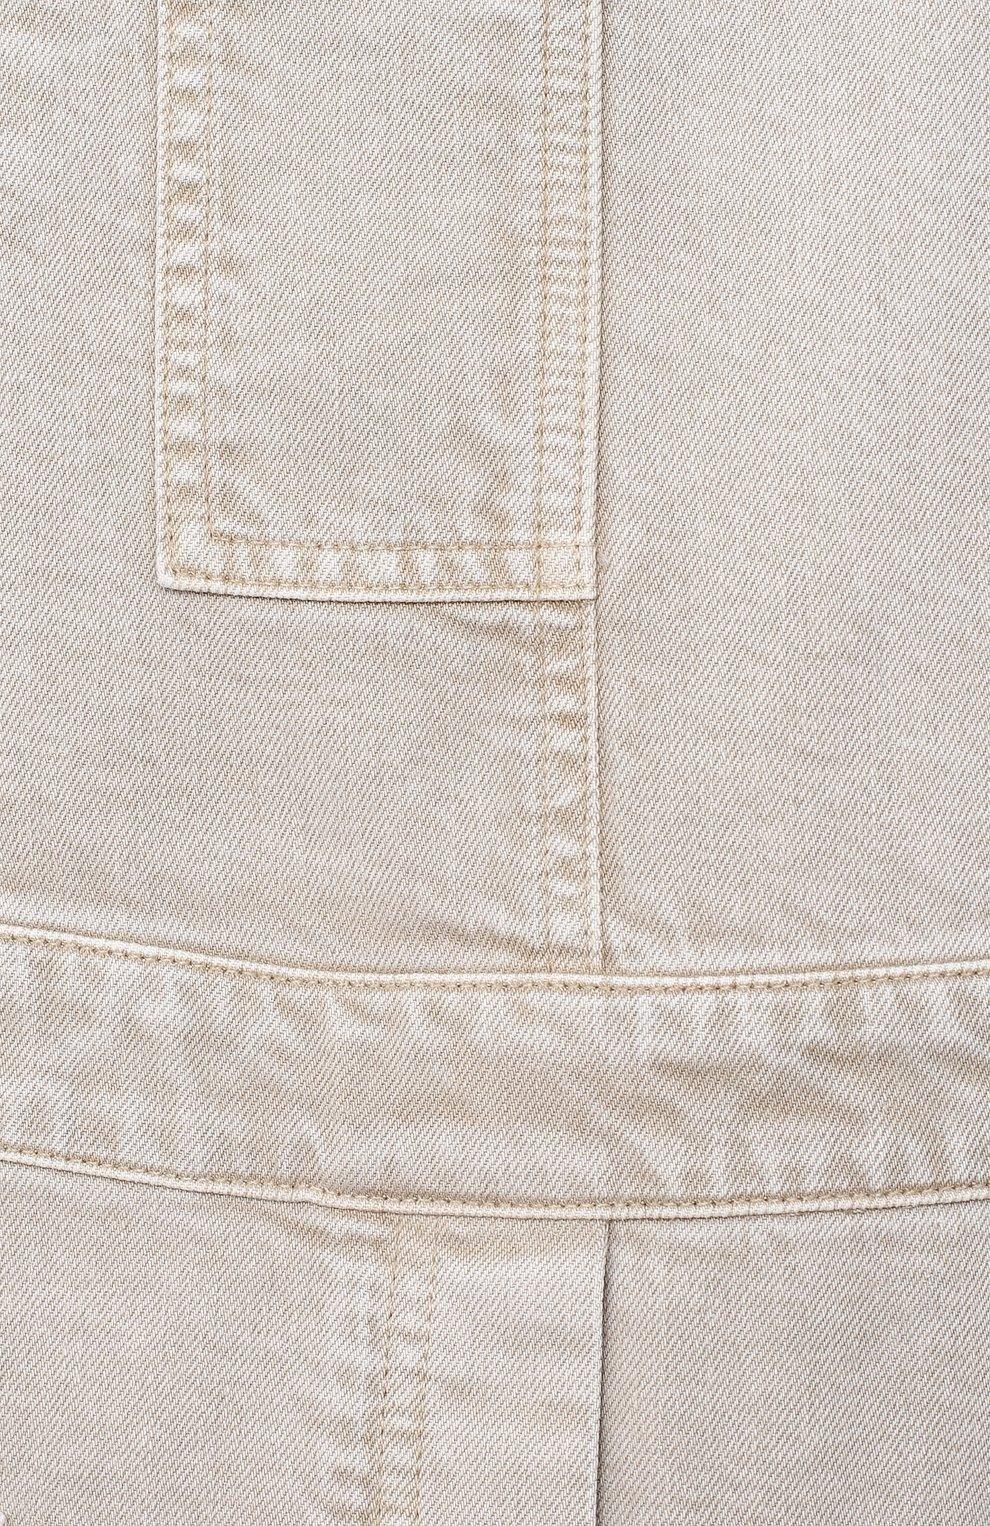 Детский хлопковый комбинезон BRUNELLO CUCINELLI бежевого цвета, арт. BH43MQ200B   Фото 3